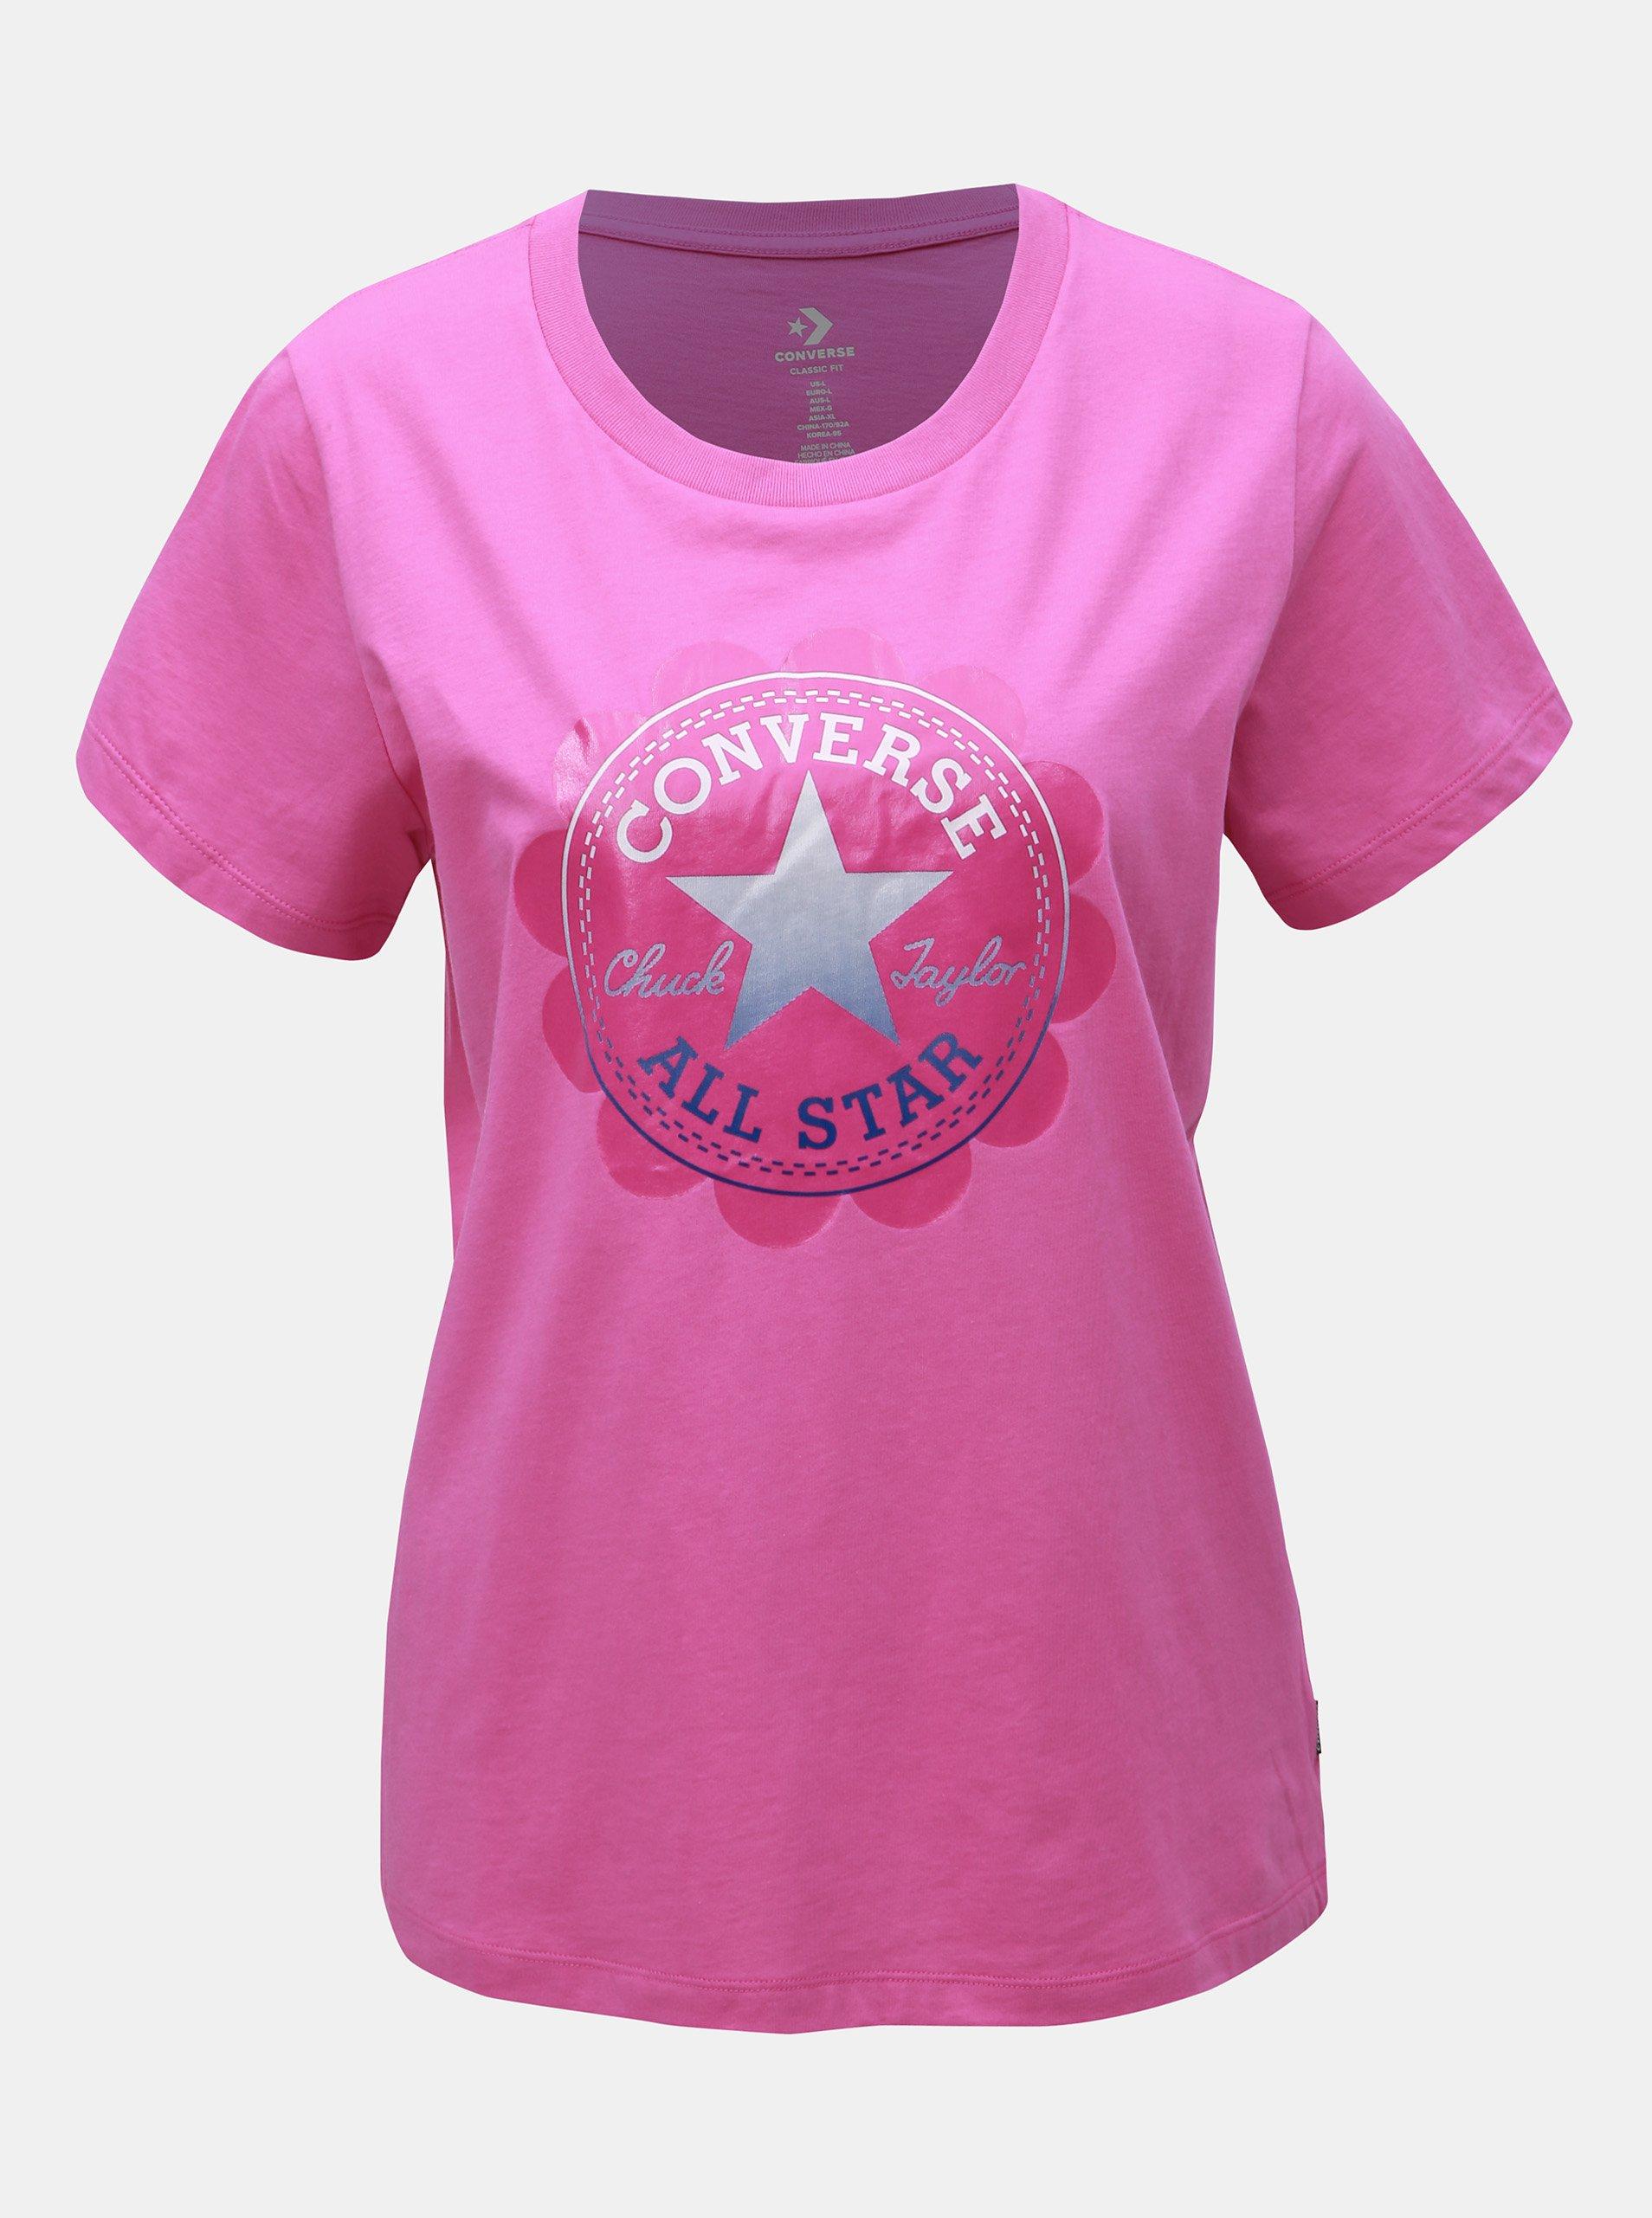 e418e56735ca Růžové dámské tričko s potiskem Converse